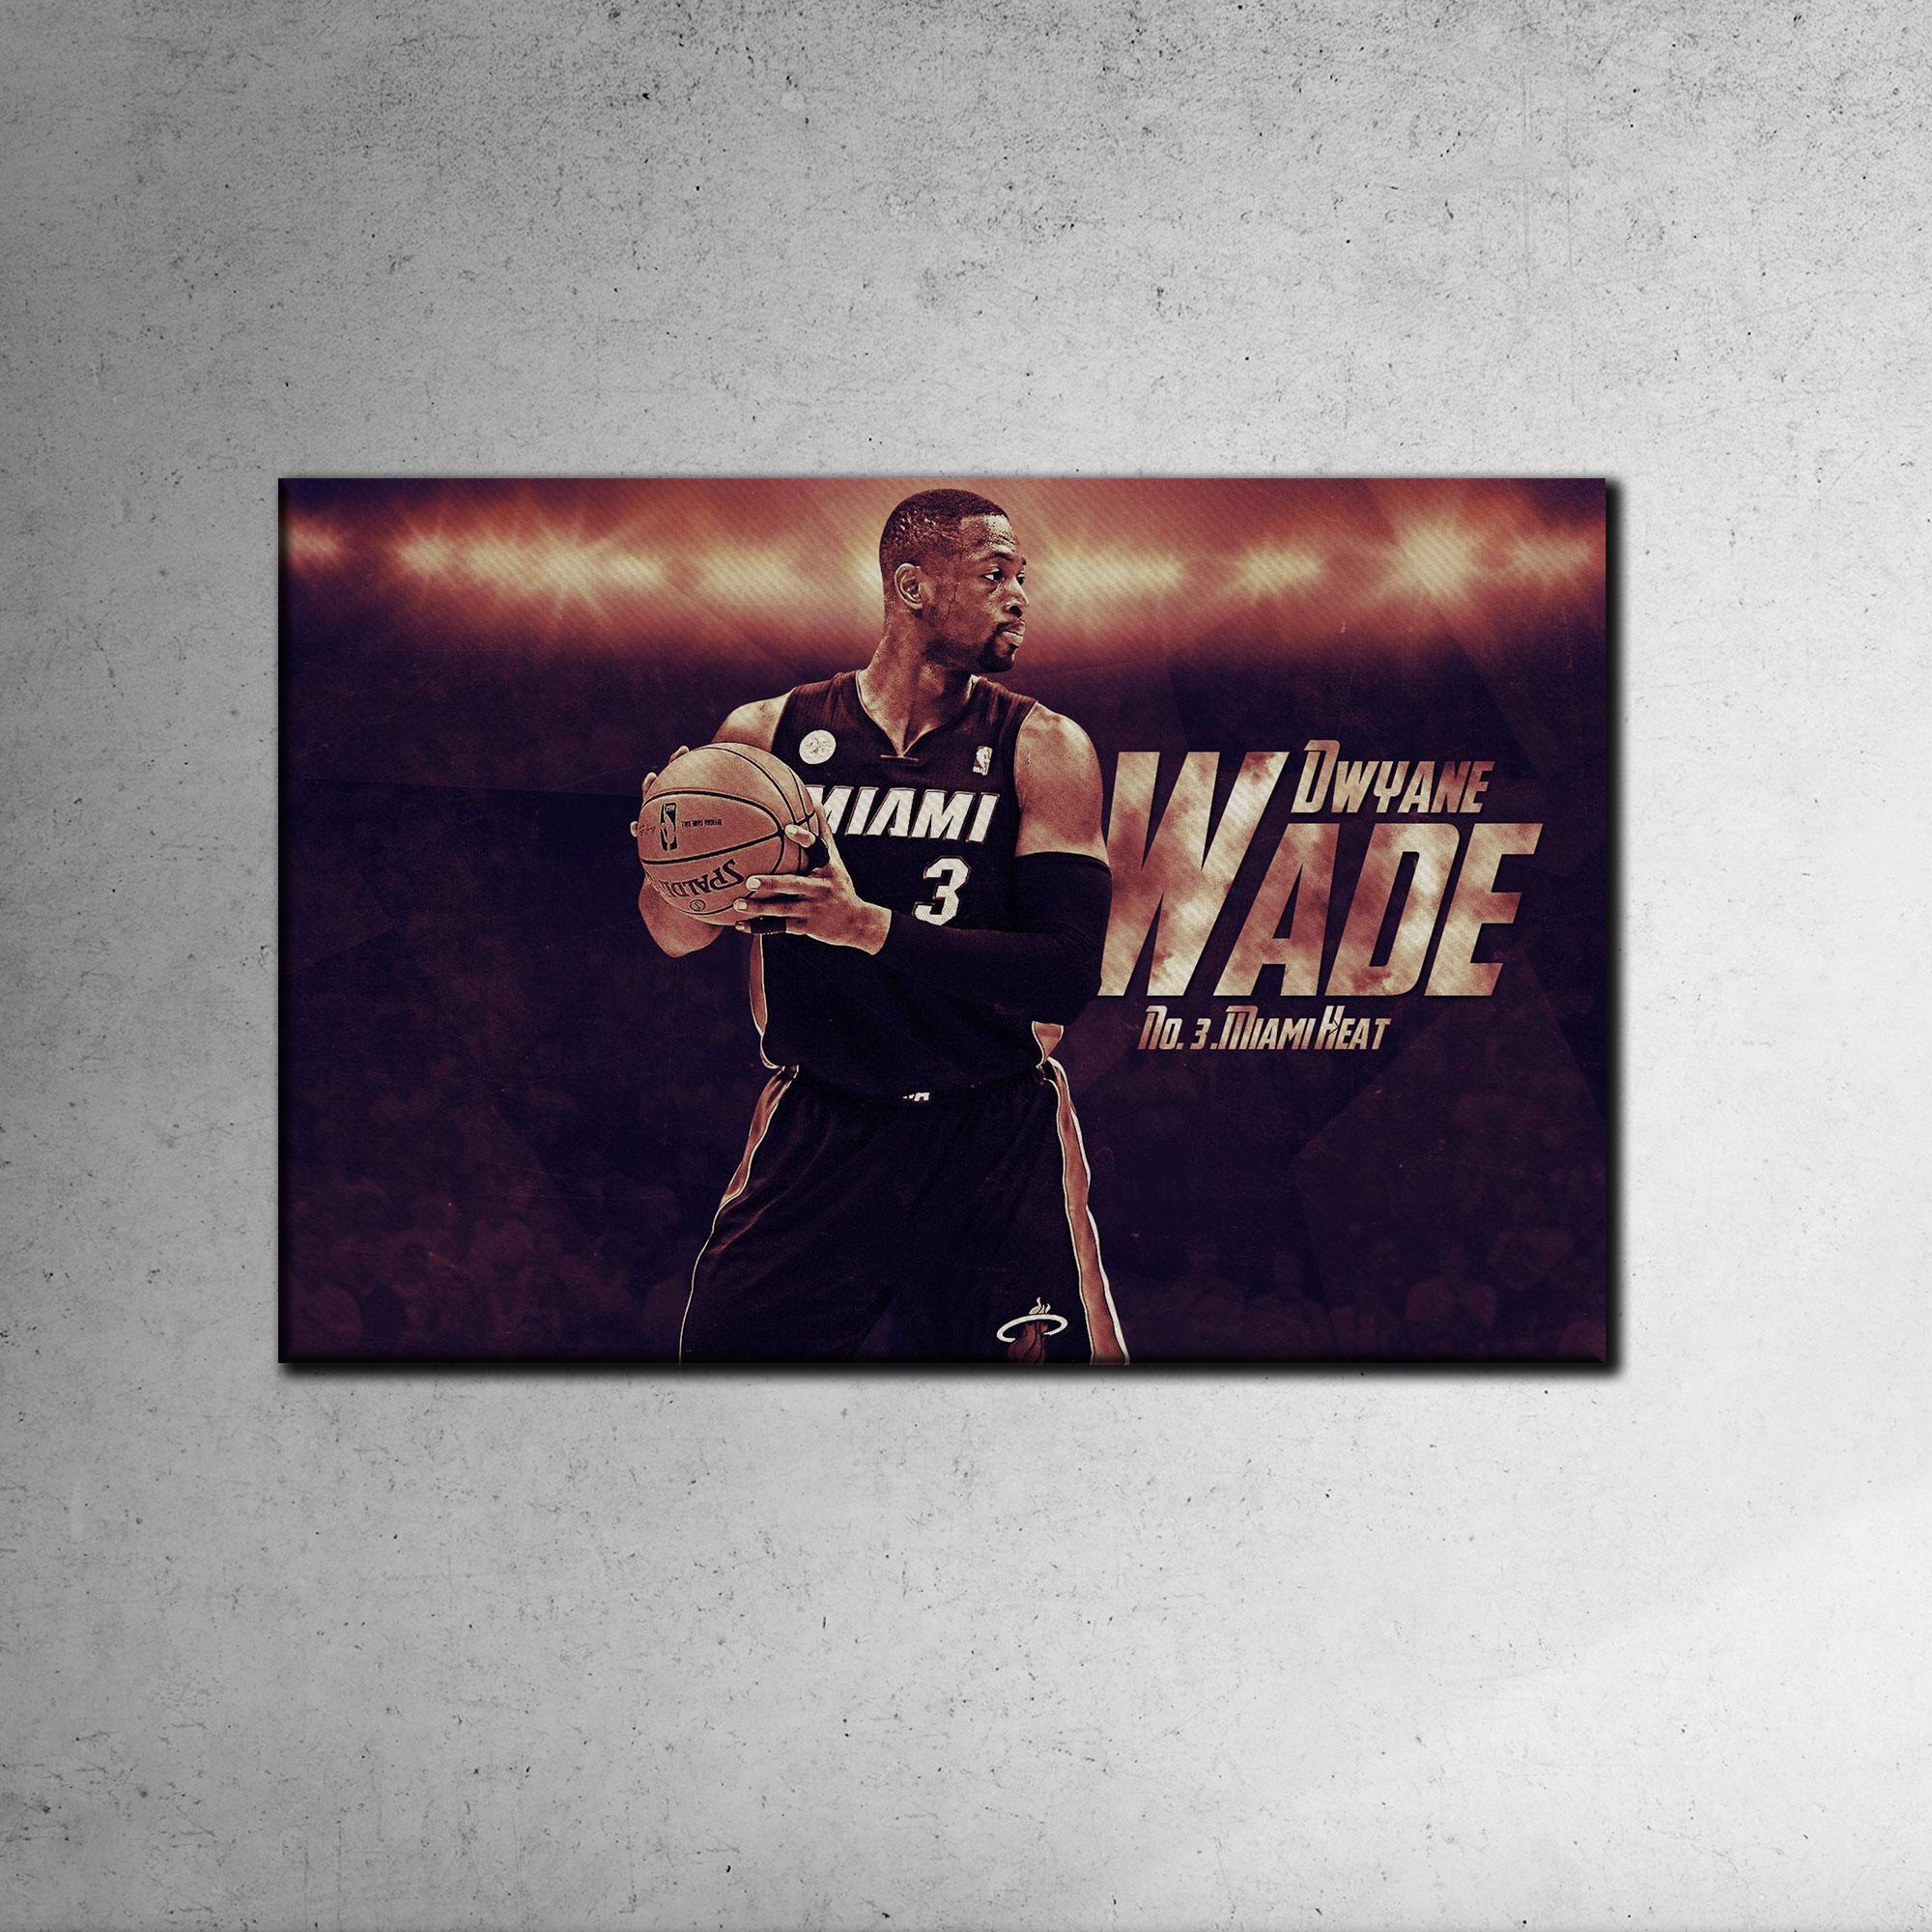 Dwayne Wade Canvas Tablo (Nba-canvas-dwayne2)